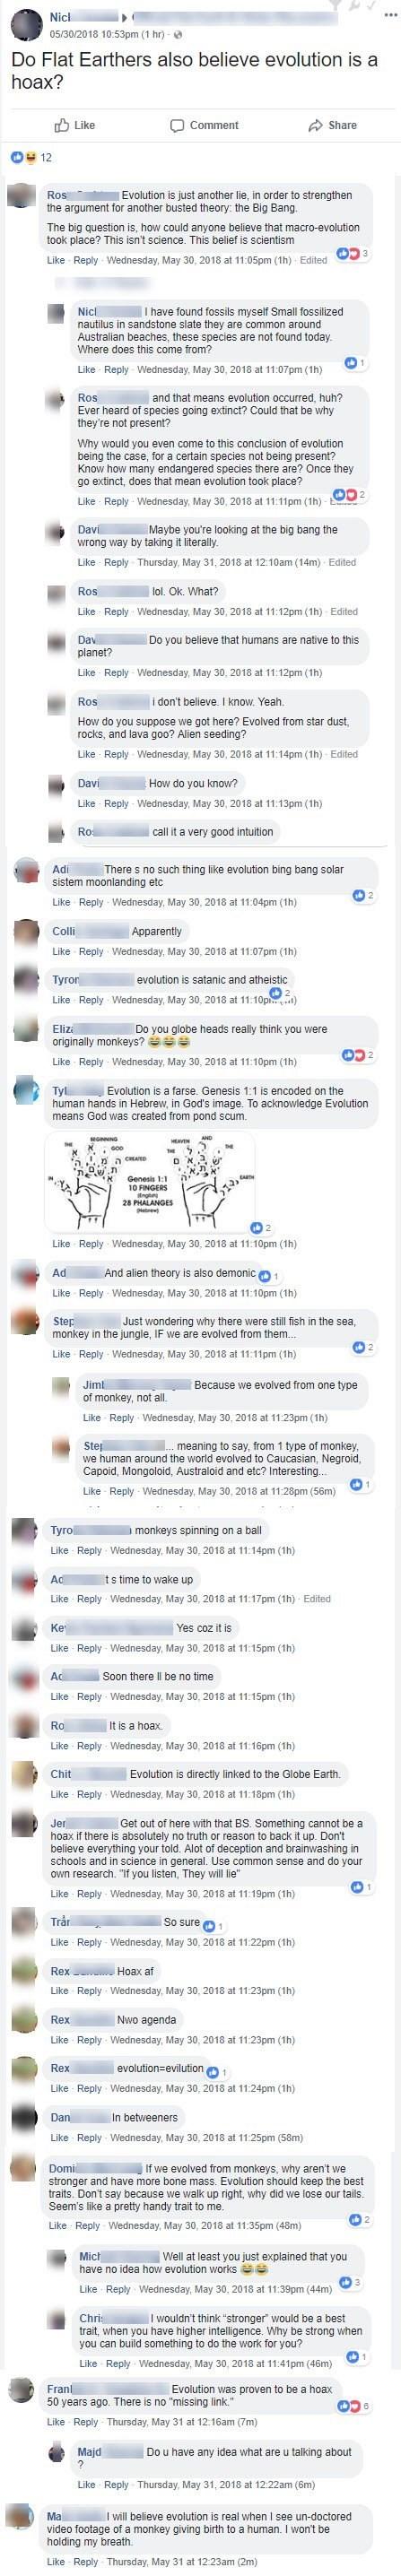 flat earth evolution facebook thread